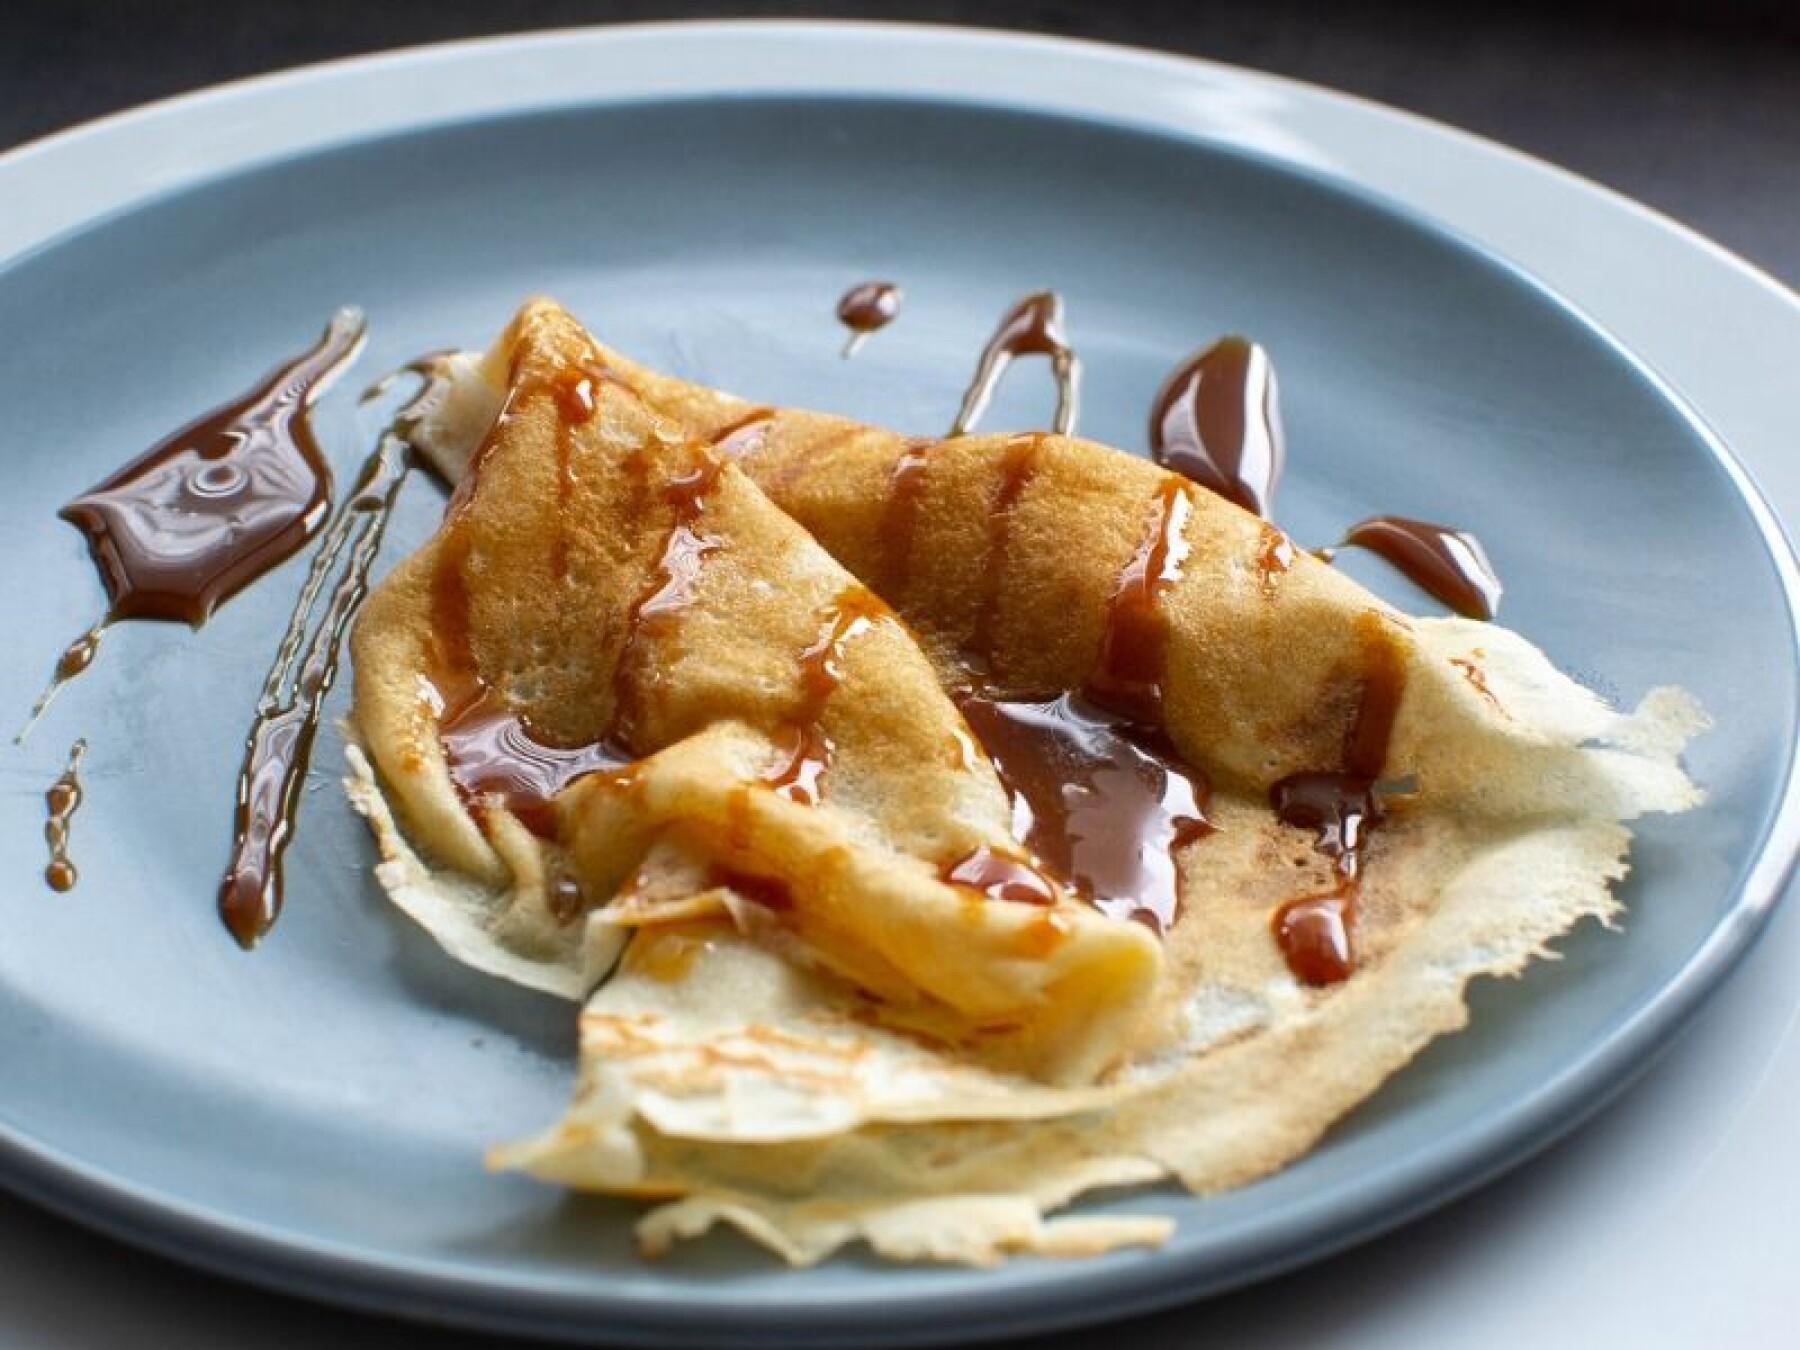 Crêpes bretonnes au caramel